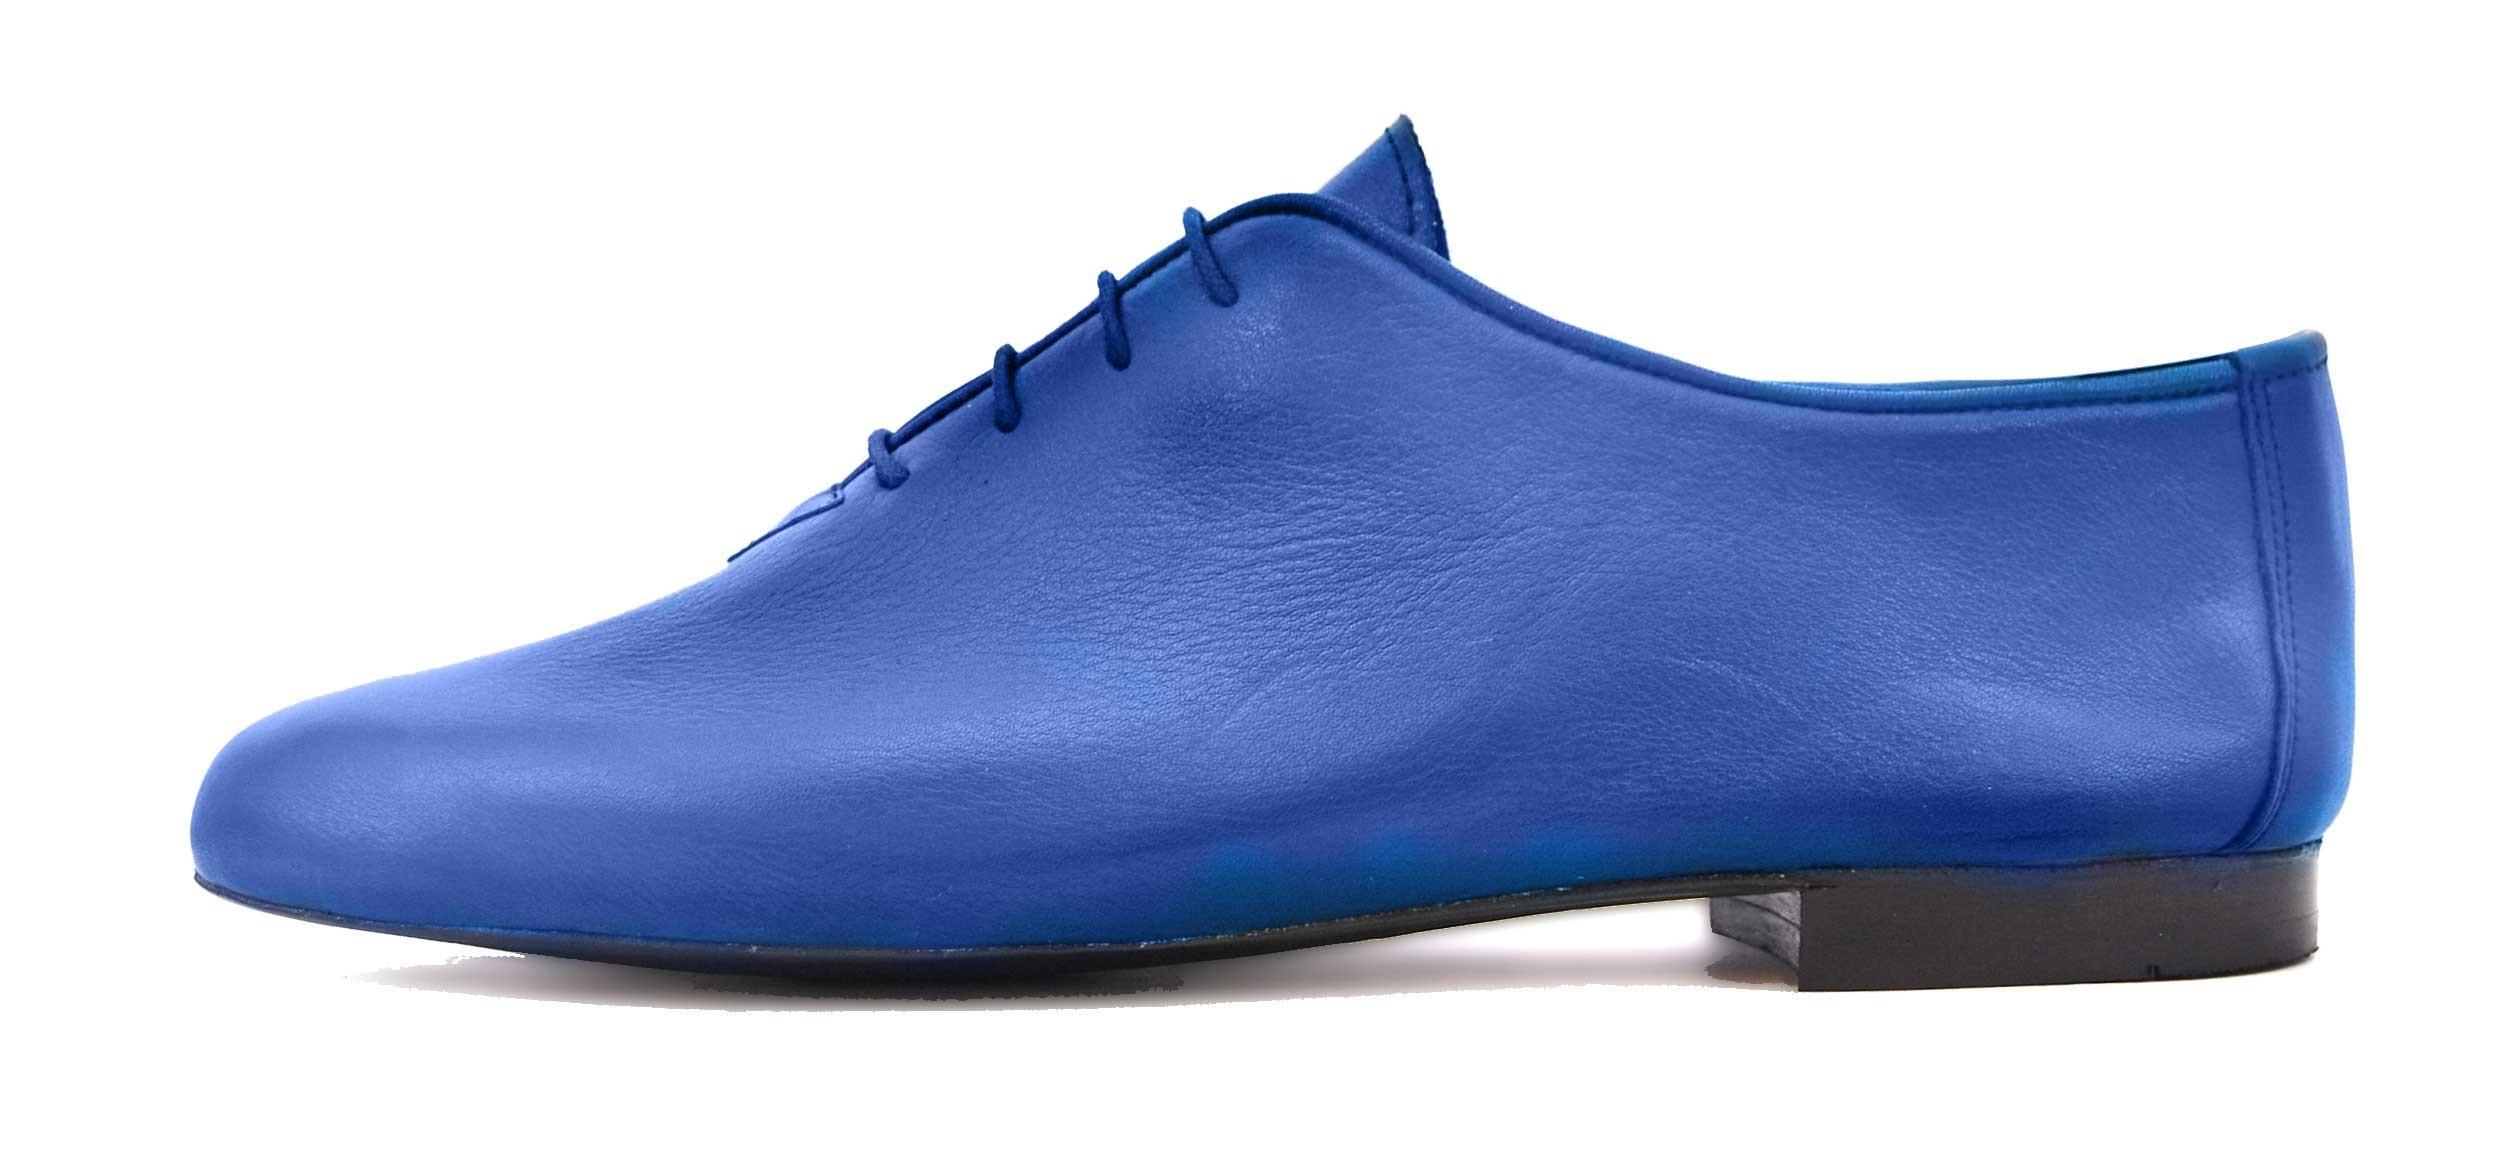 Foto 1 de Zapatos Napa Julio Iglesias Cordon Azulon